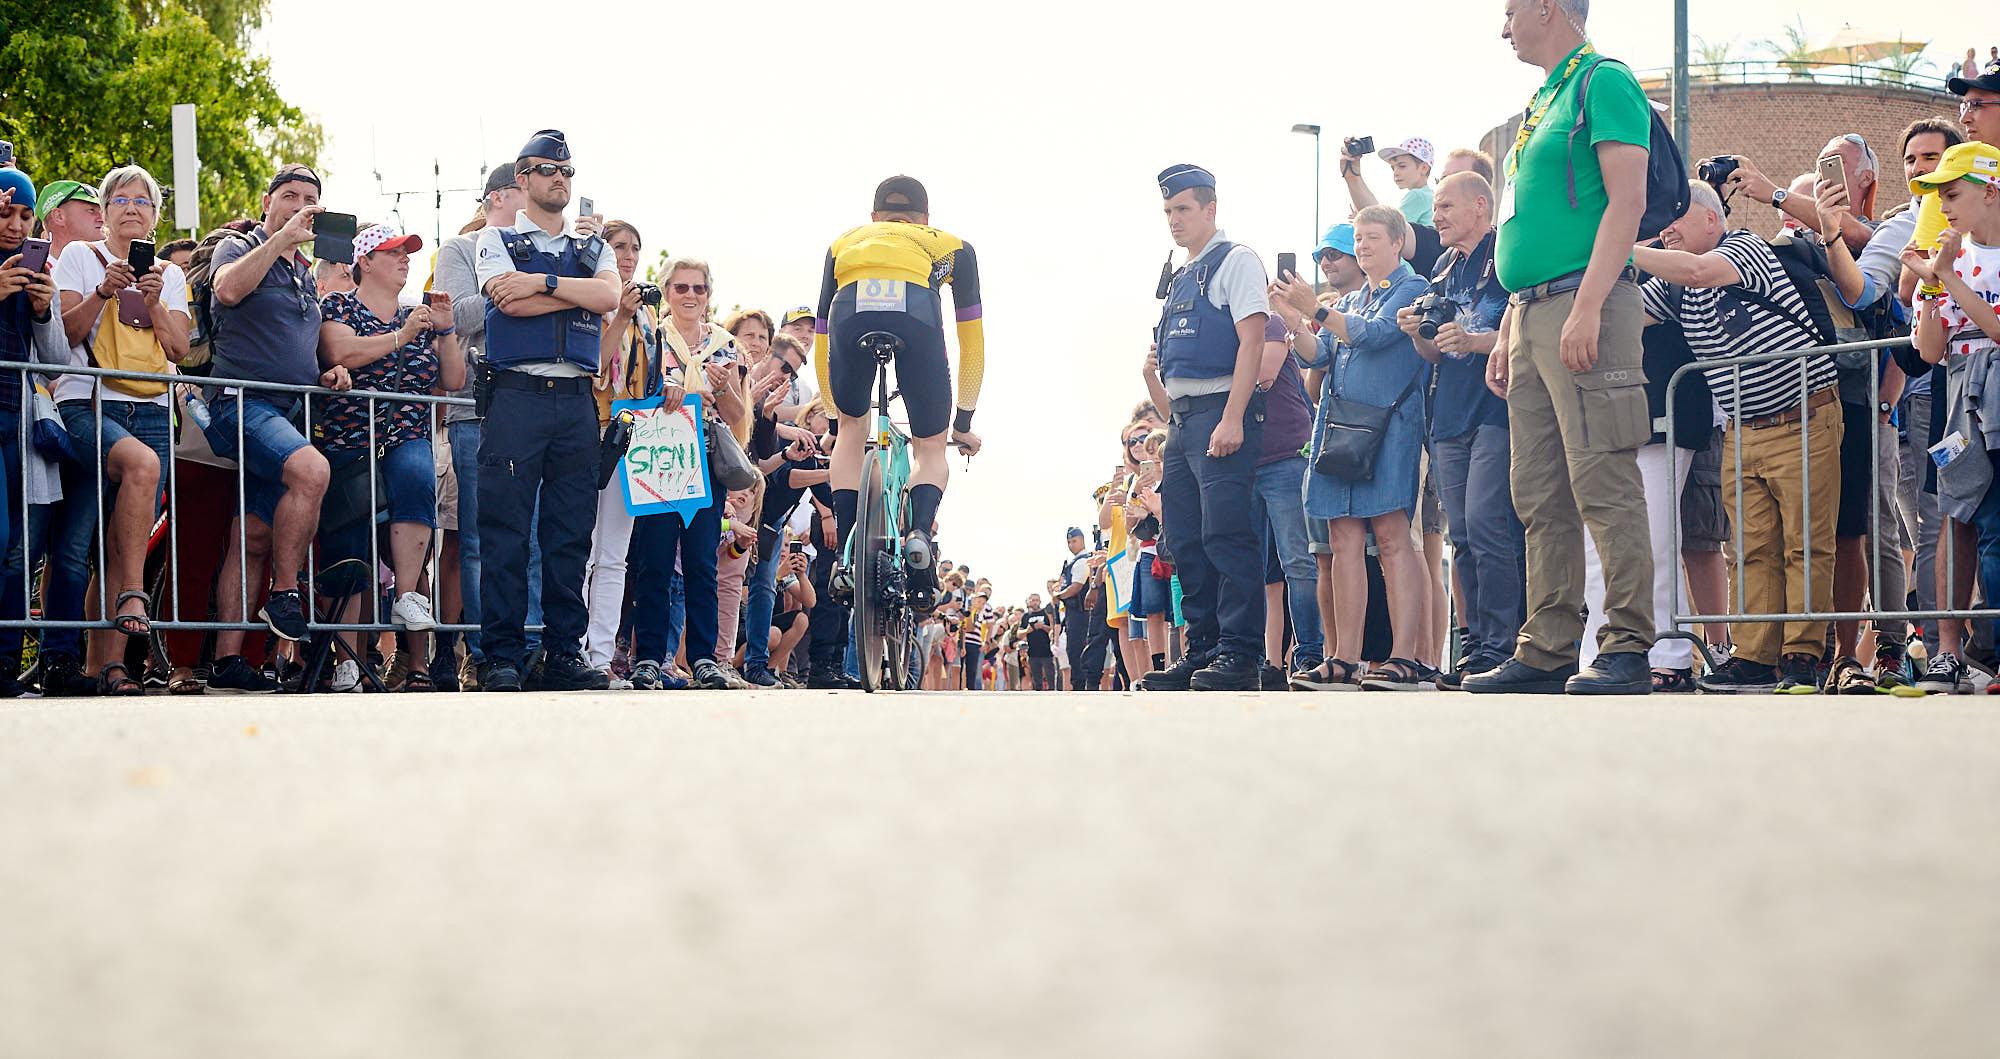 Jumbo-Visma cyclist Steven Kruiswijk in Brussels during the 2019 Tour de France